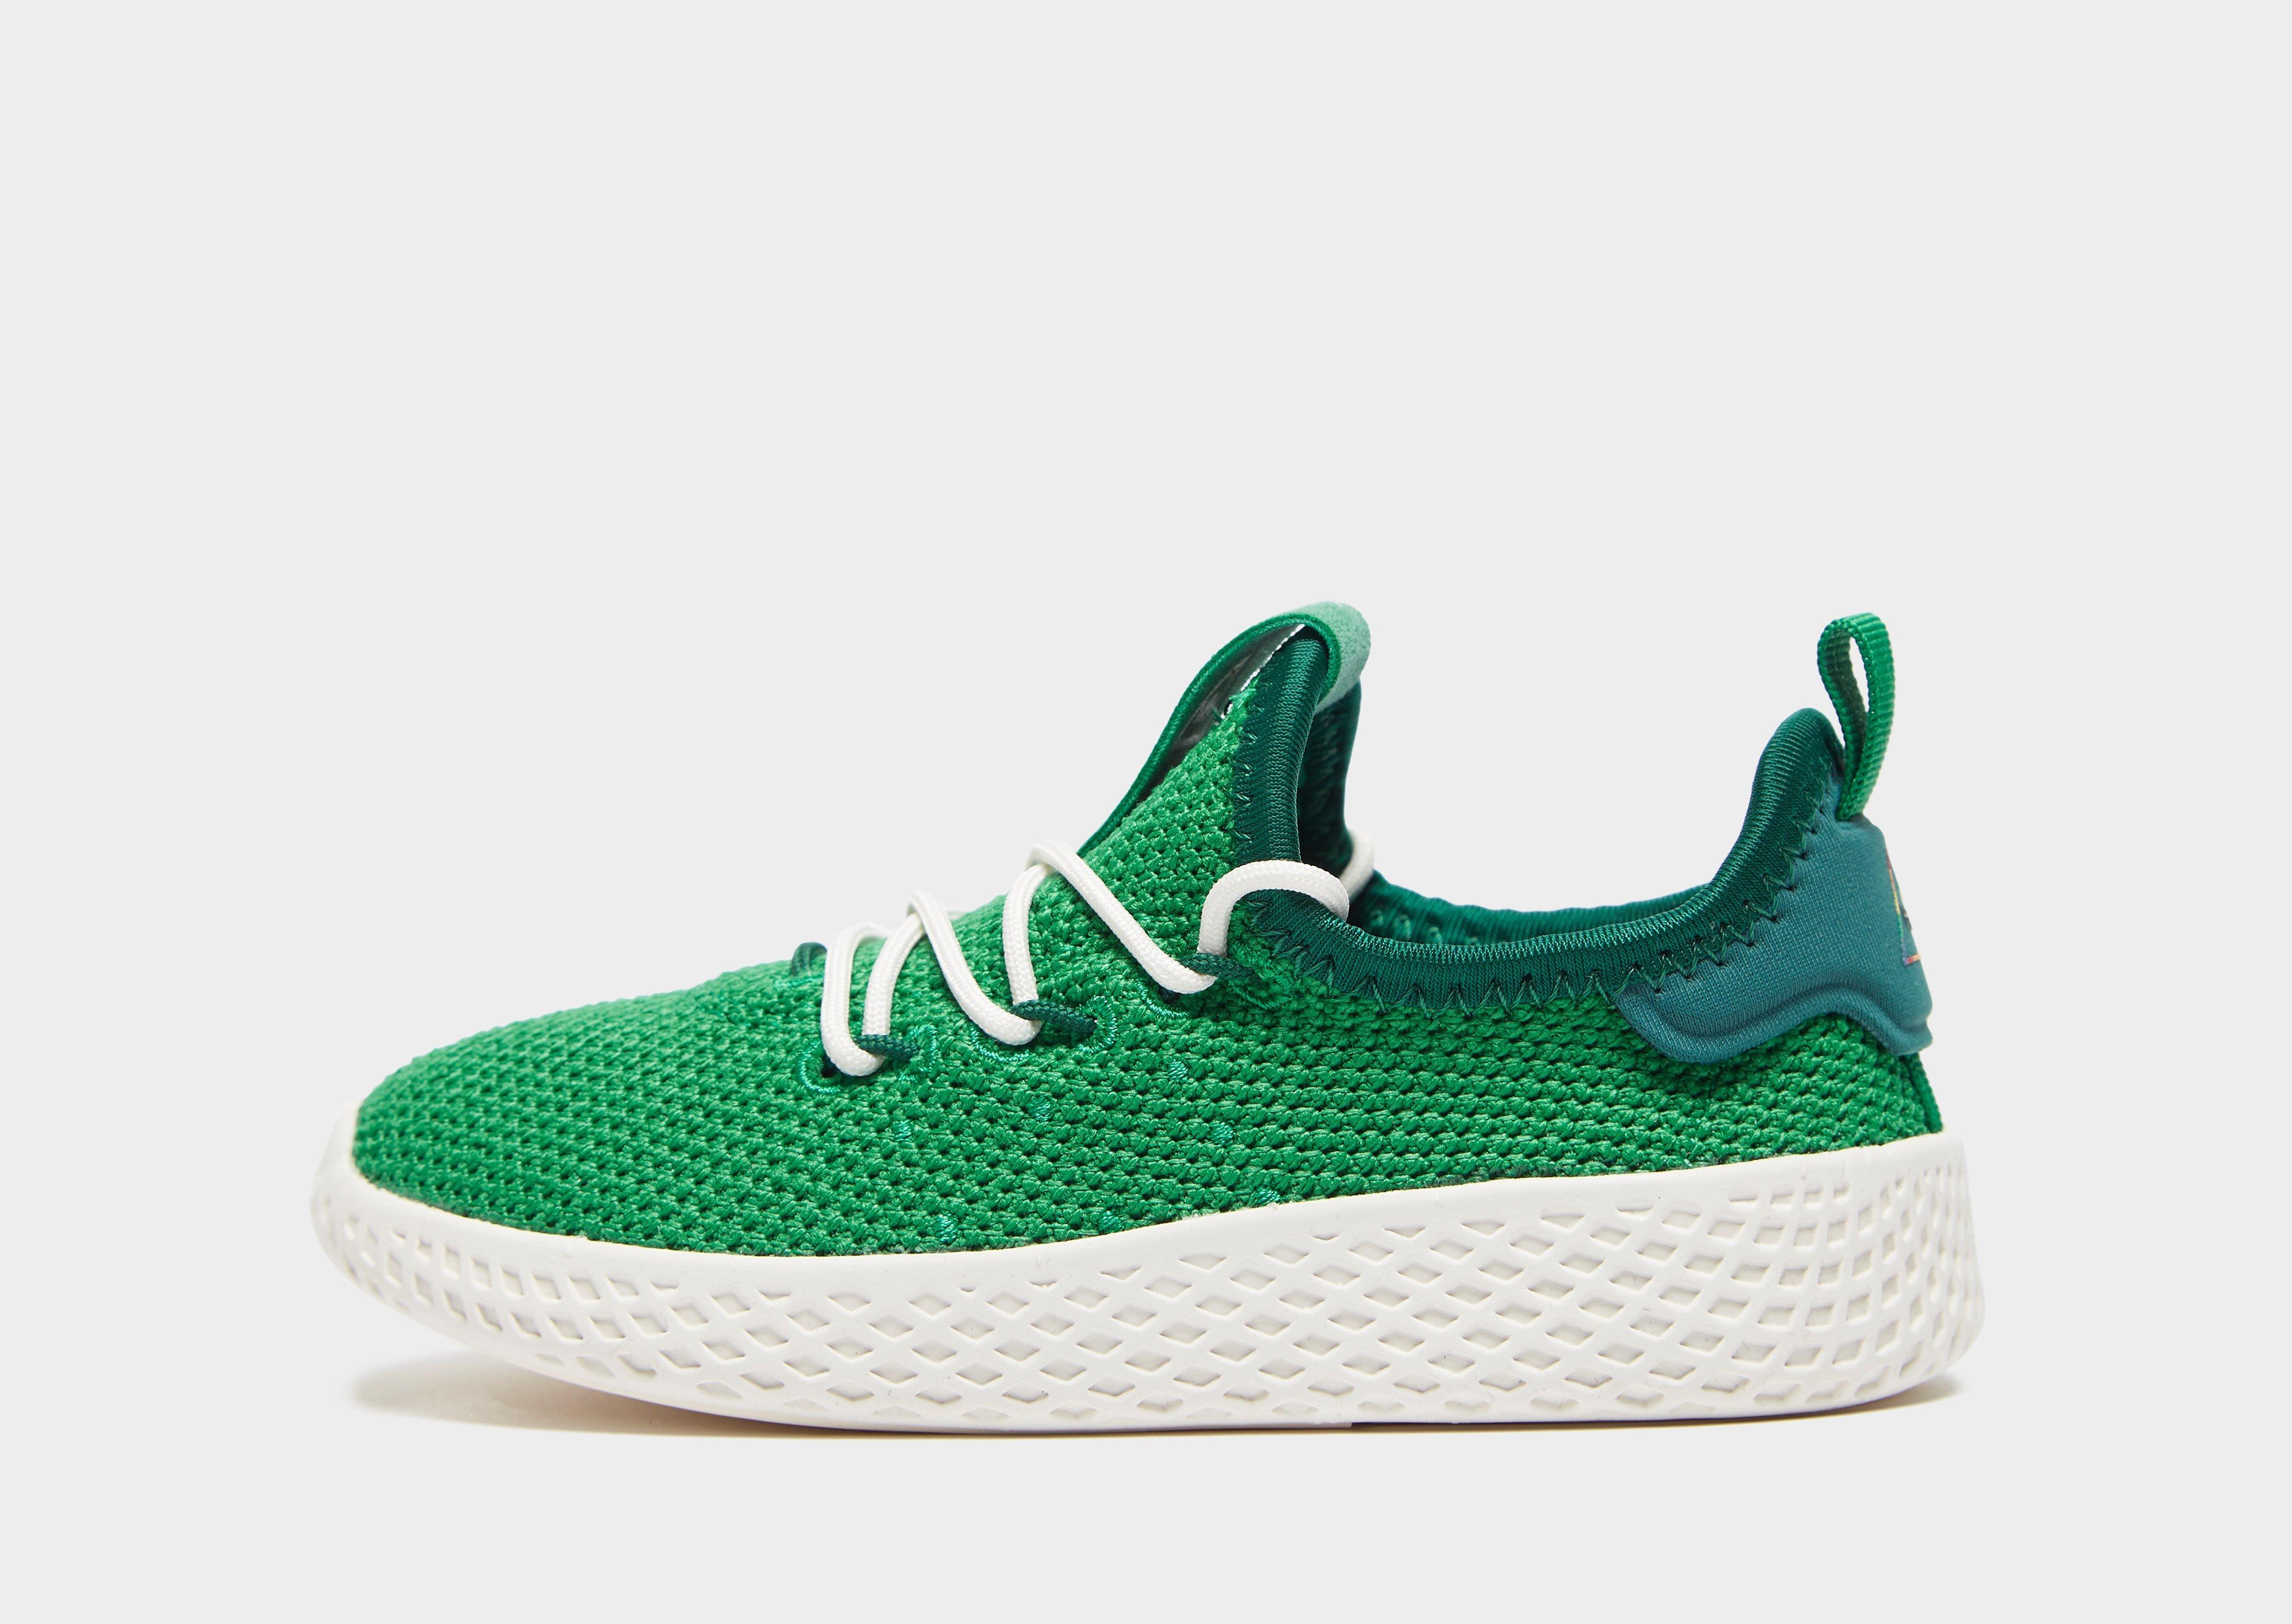 adidas Originals x Pharrell Williams Tennis Hu Baby | JD Sports Sverige